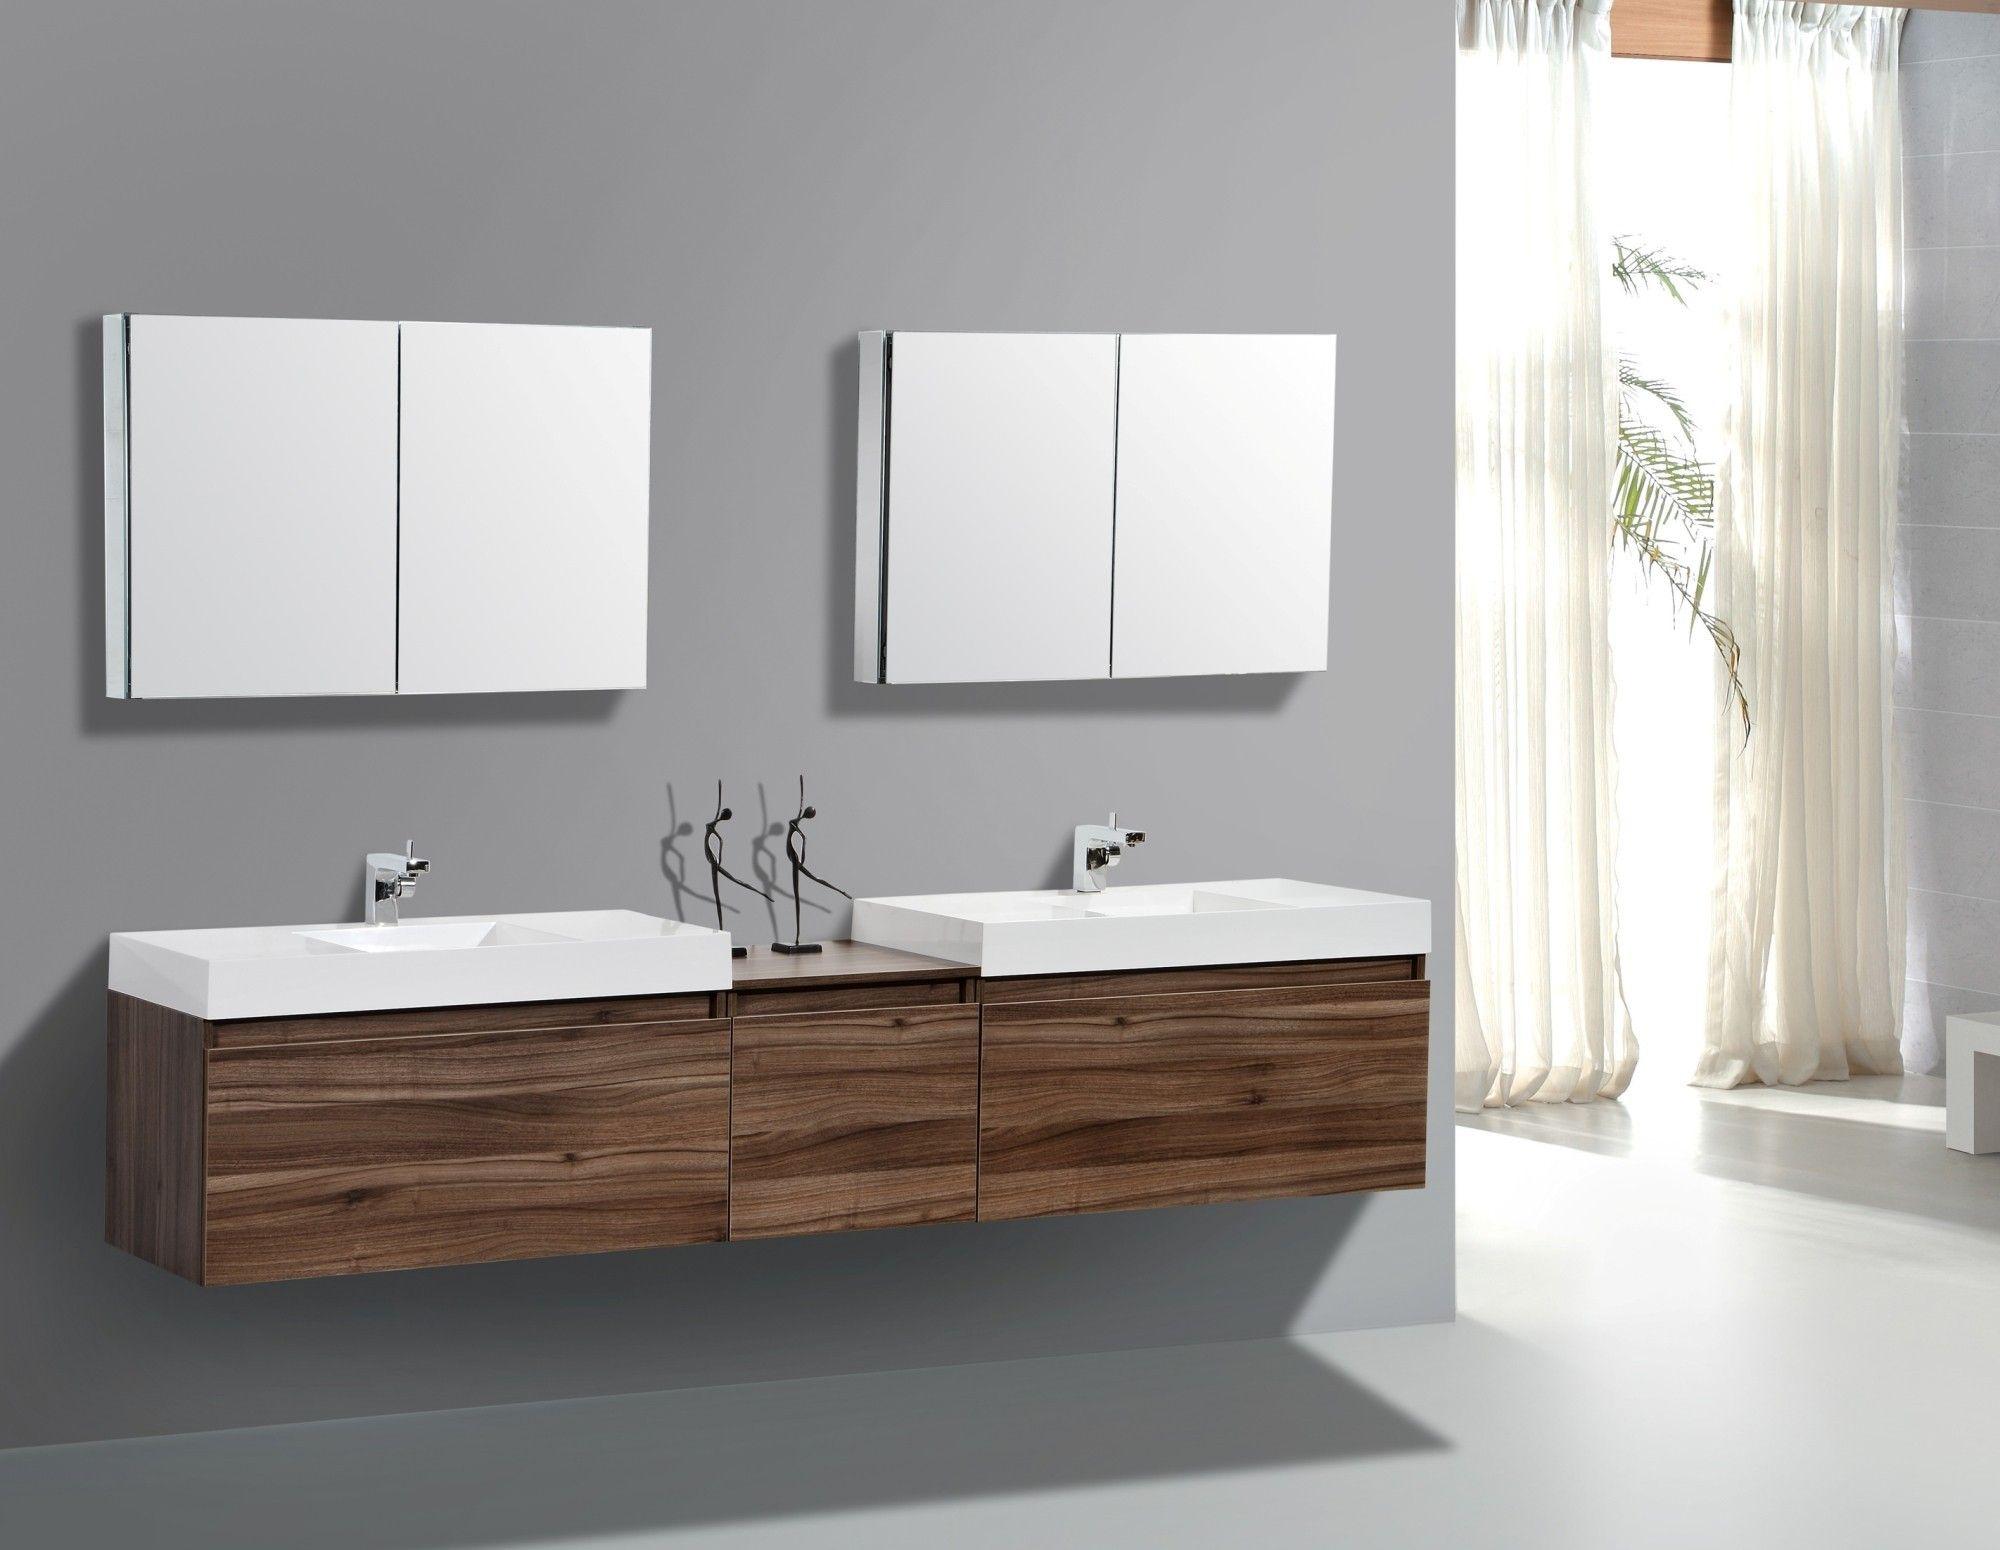 product cfm e double hayneedle element set vanity bathroom master in vanities washington design